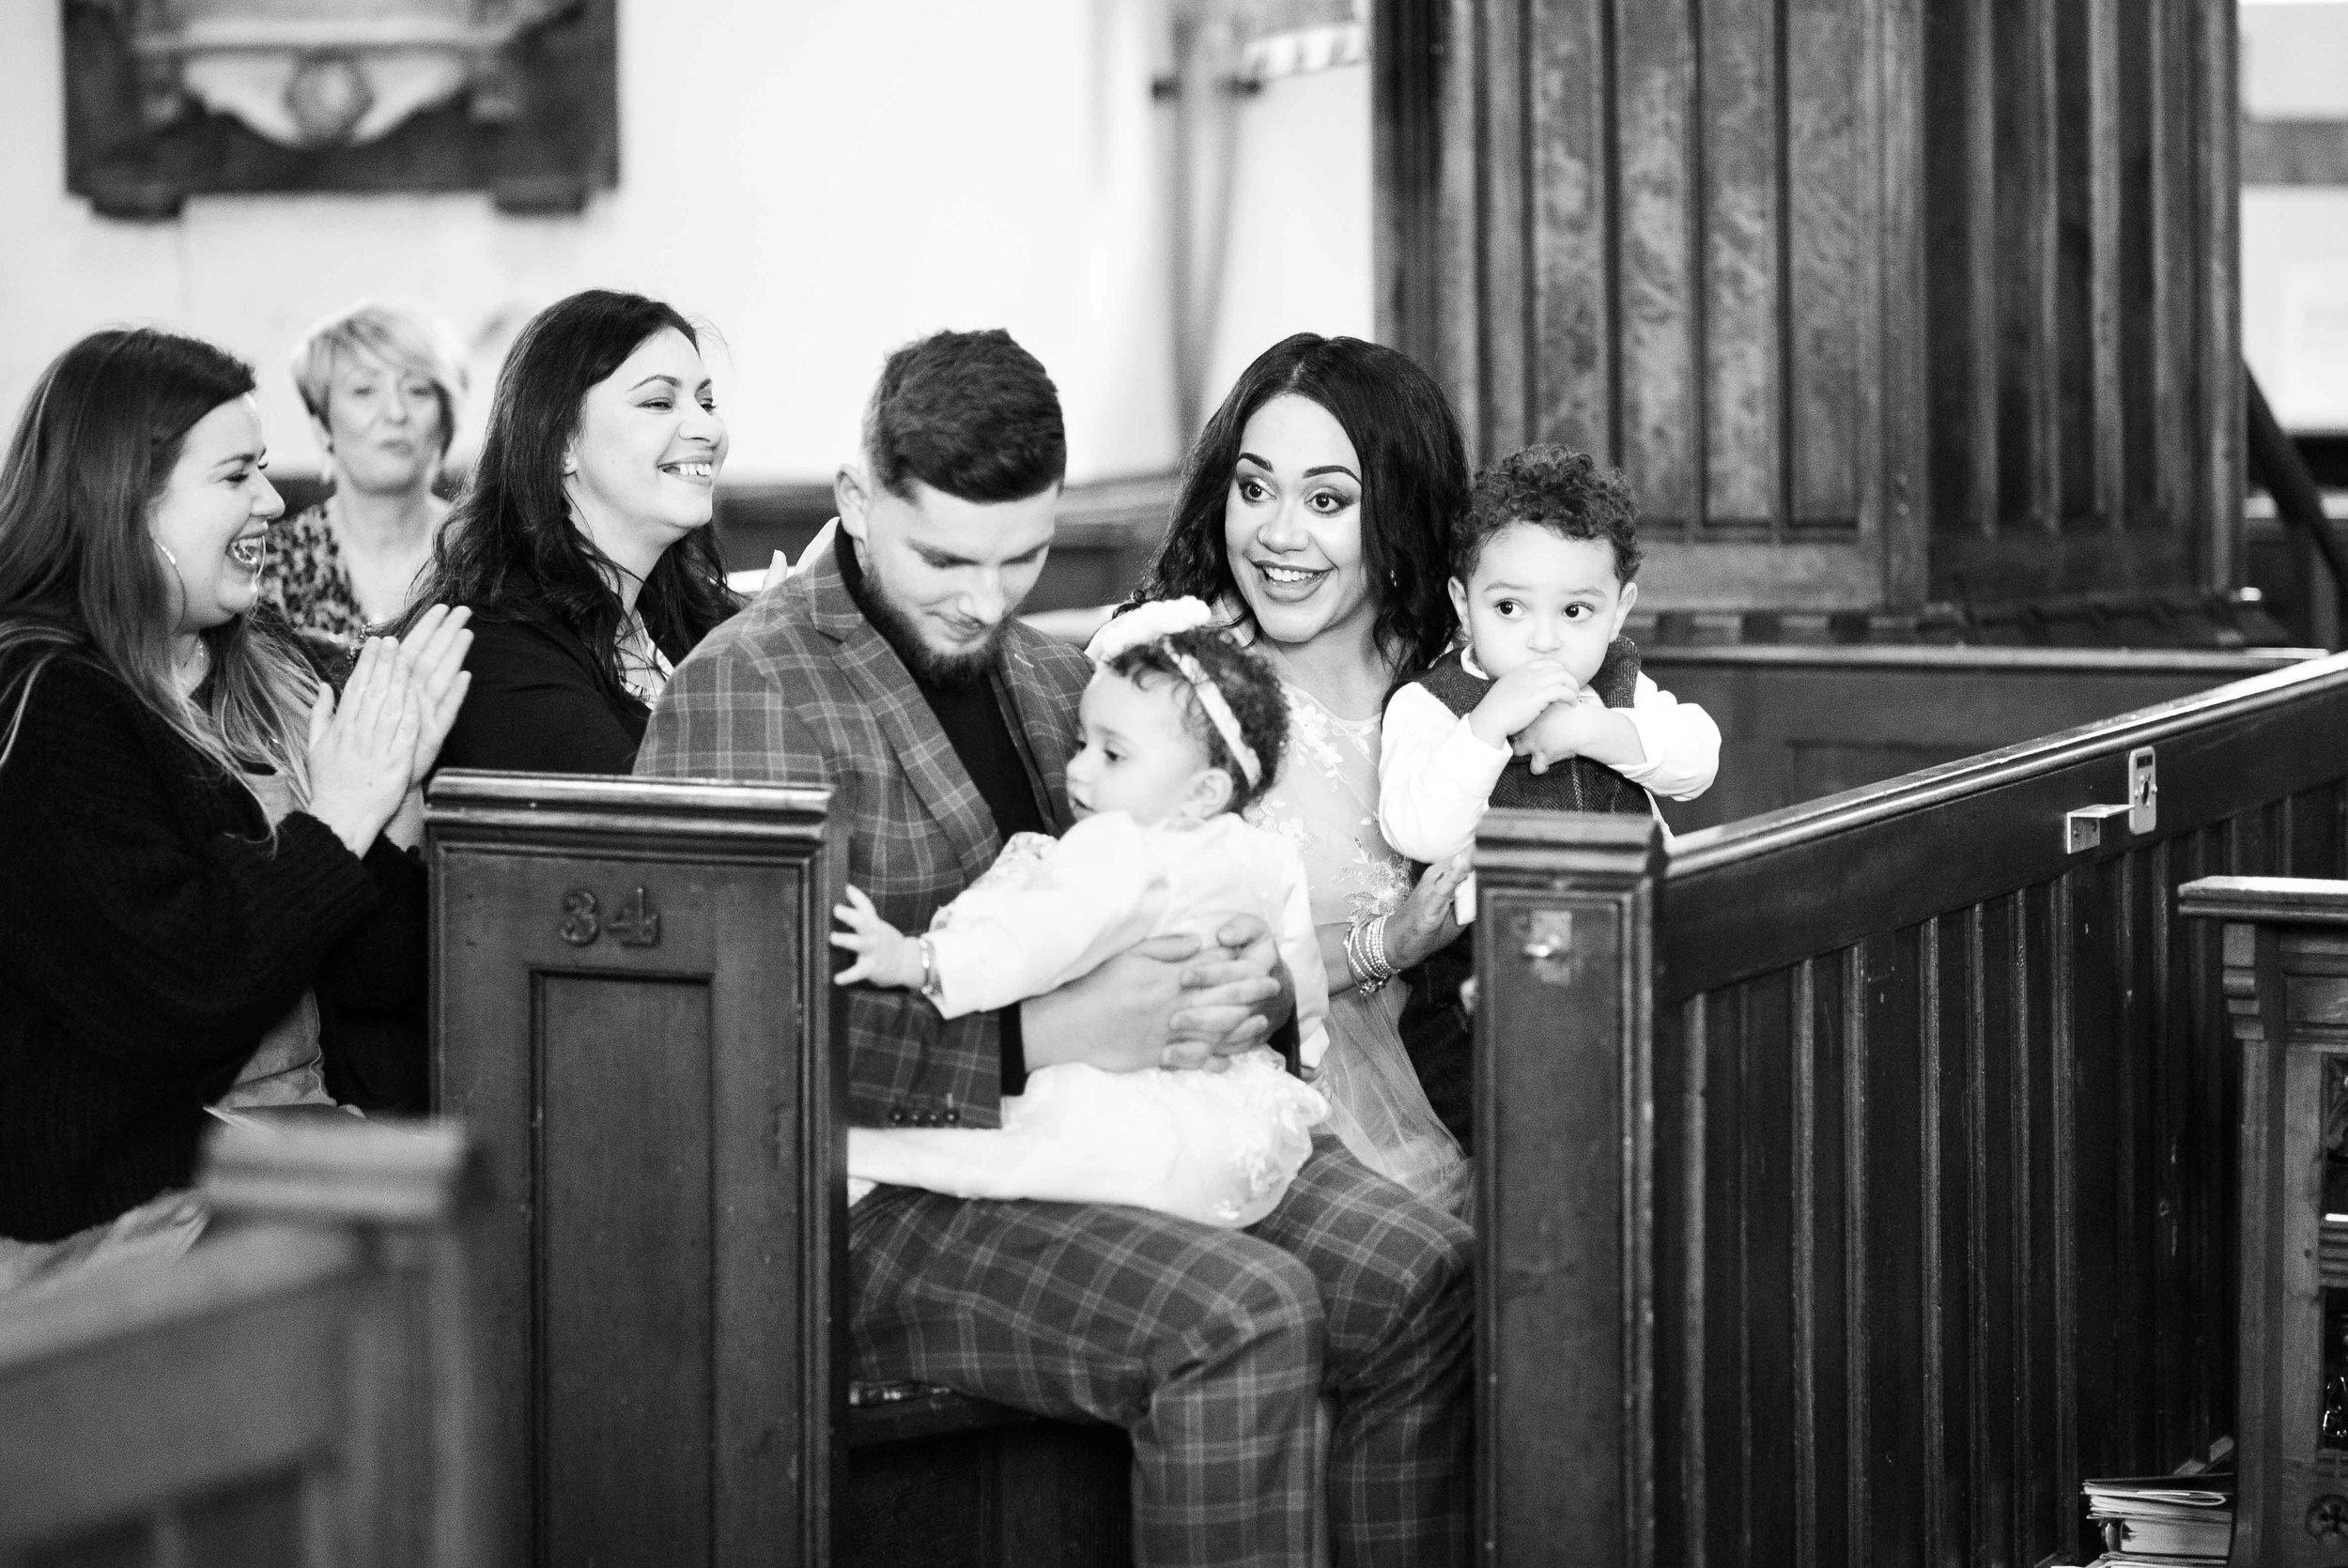 Lea-cooper-photography-christening-photographer-baptism-wolverhampton-wednesbury-walsall-willenhall-dudley-church-chapel-event-photography-7.jpg